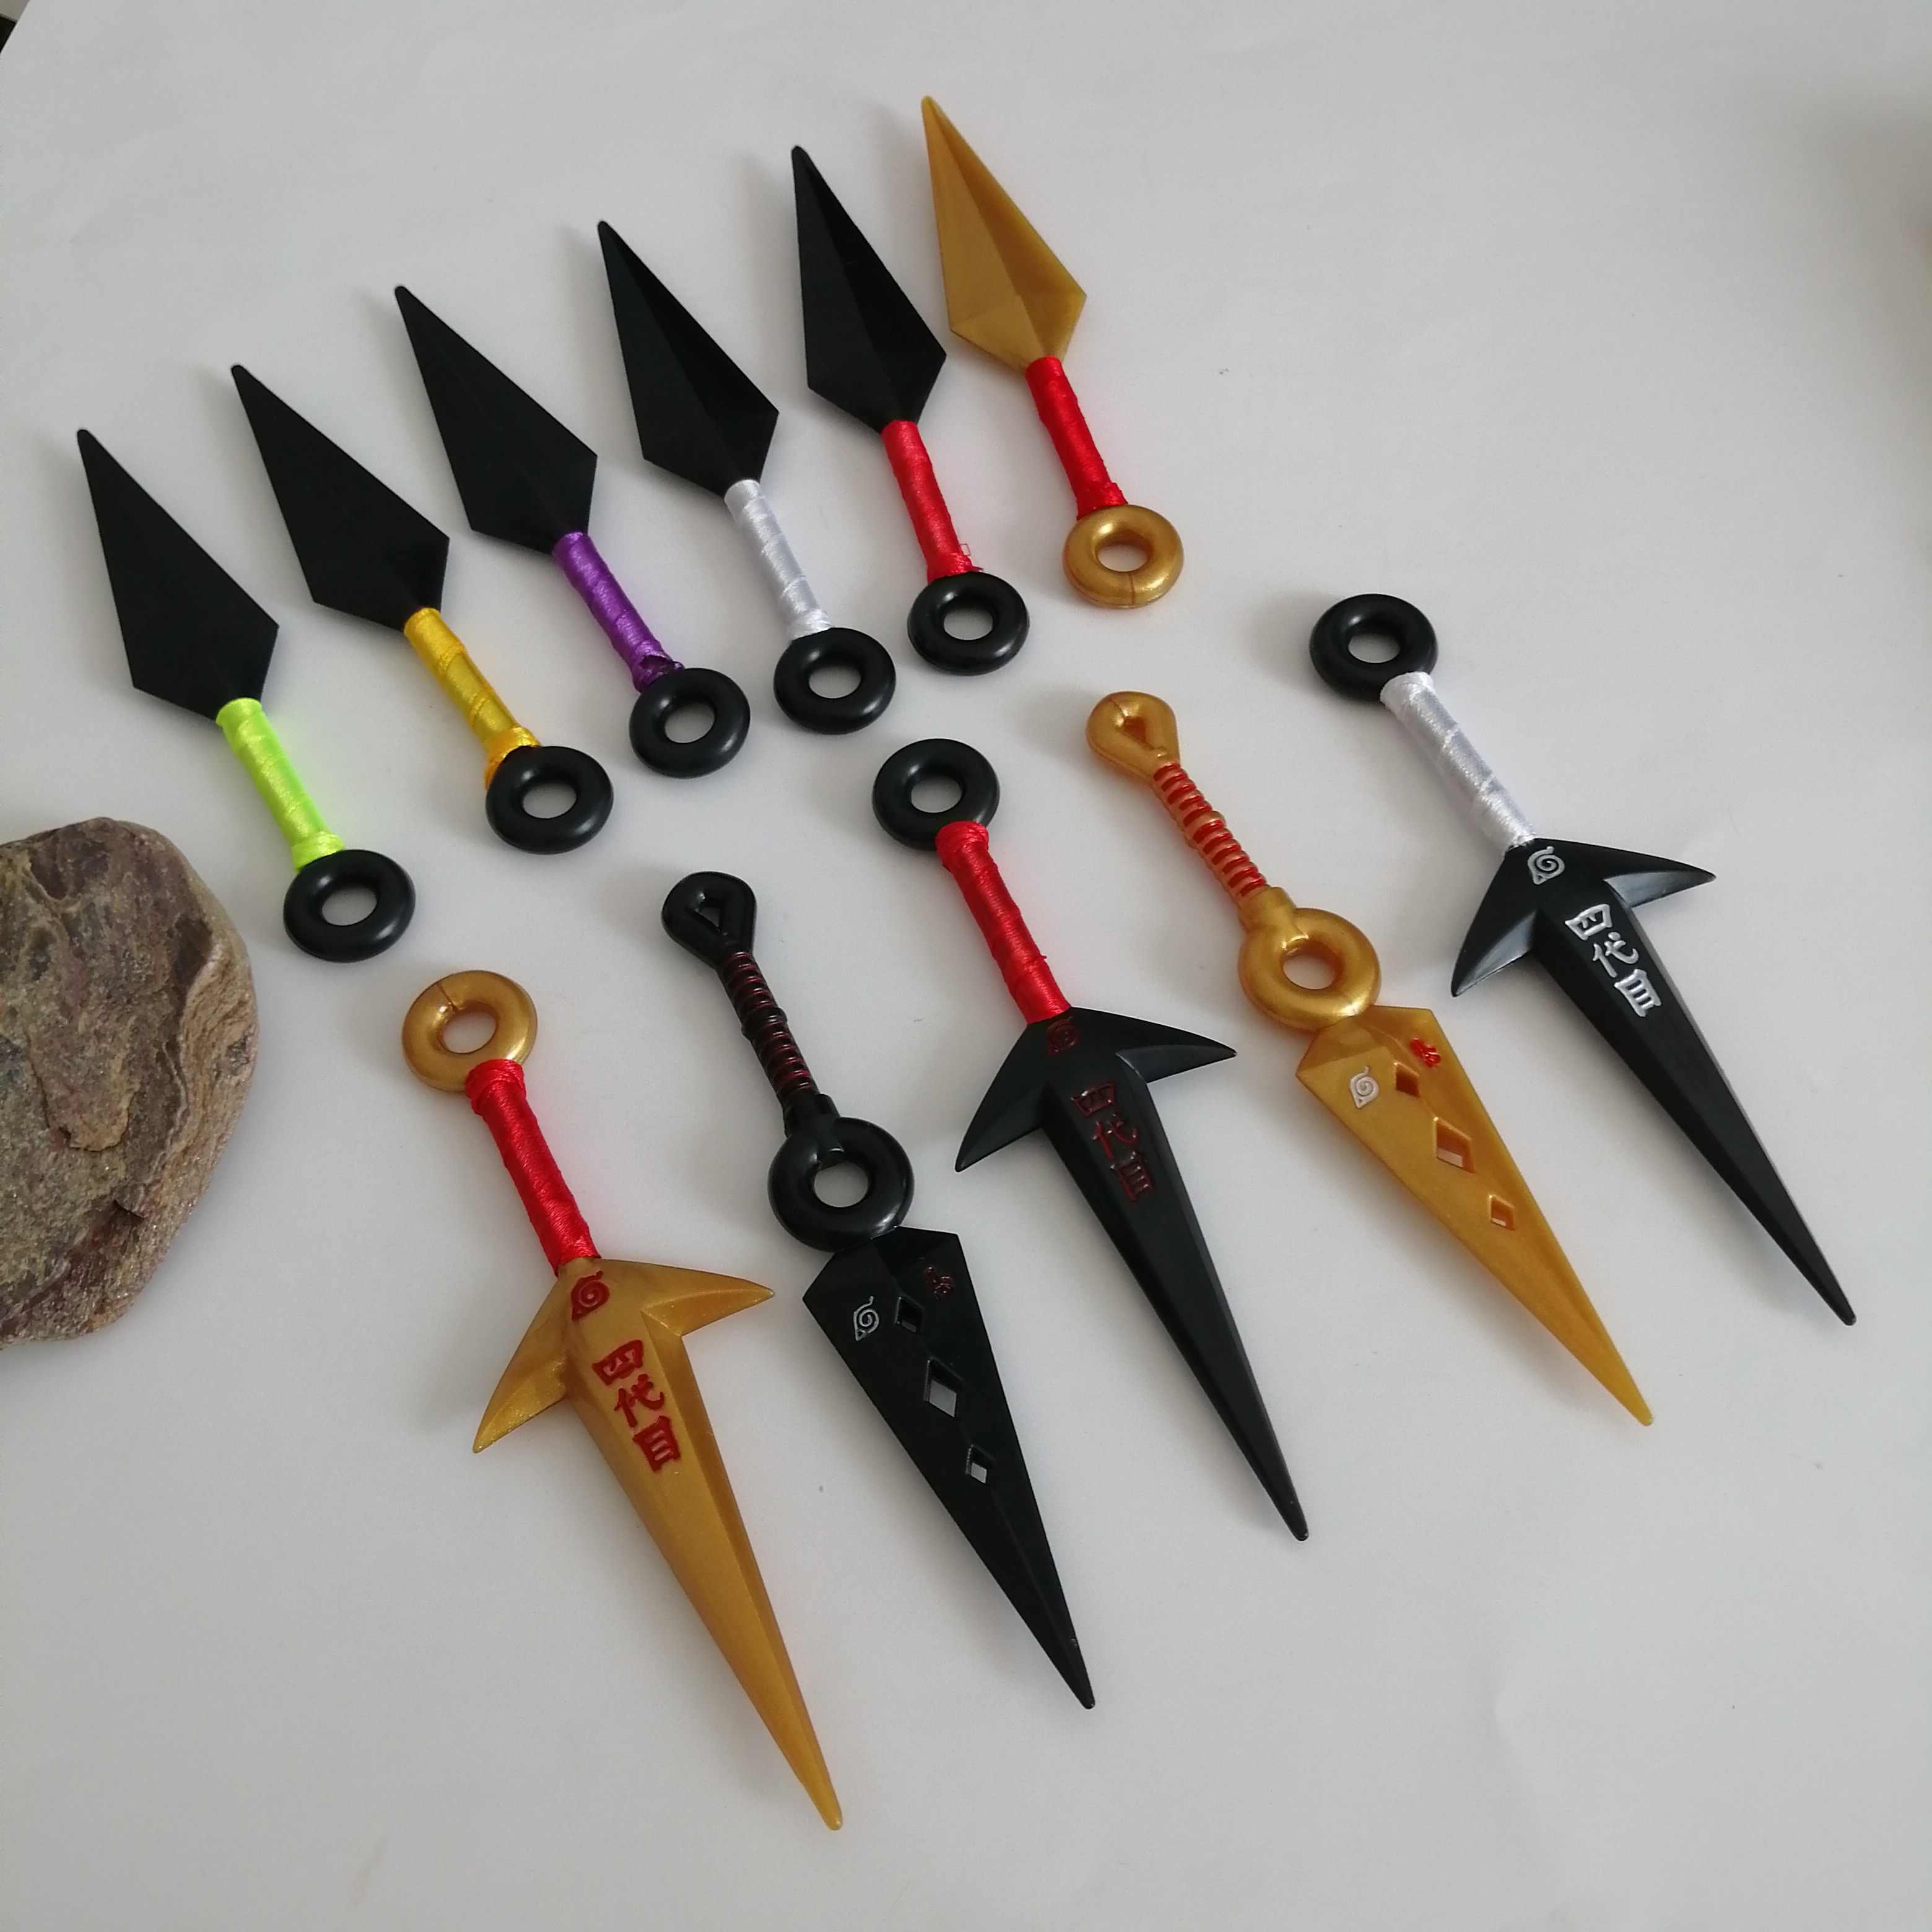 1 pcs อะนิเมะ Naruto Ninja Uzumaki Kunai Shuriken โยนอาวุธ Props คอสเพลย์ของเล่น